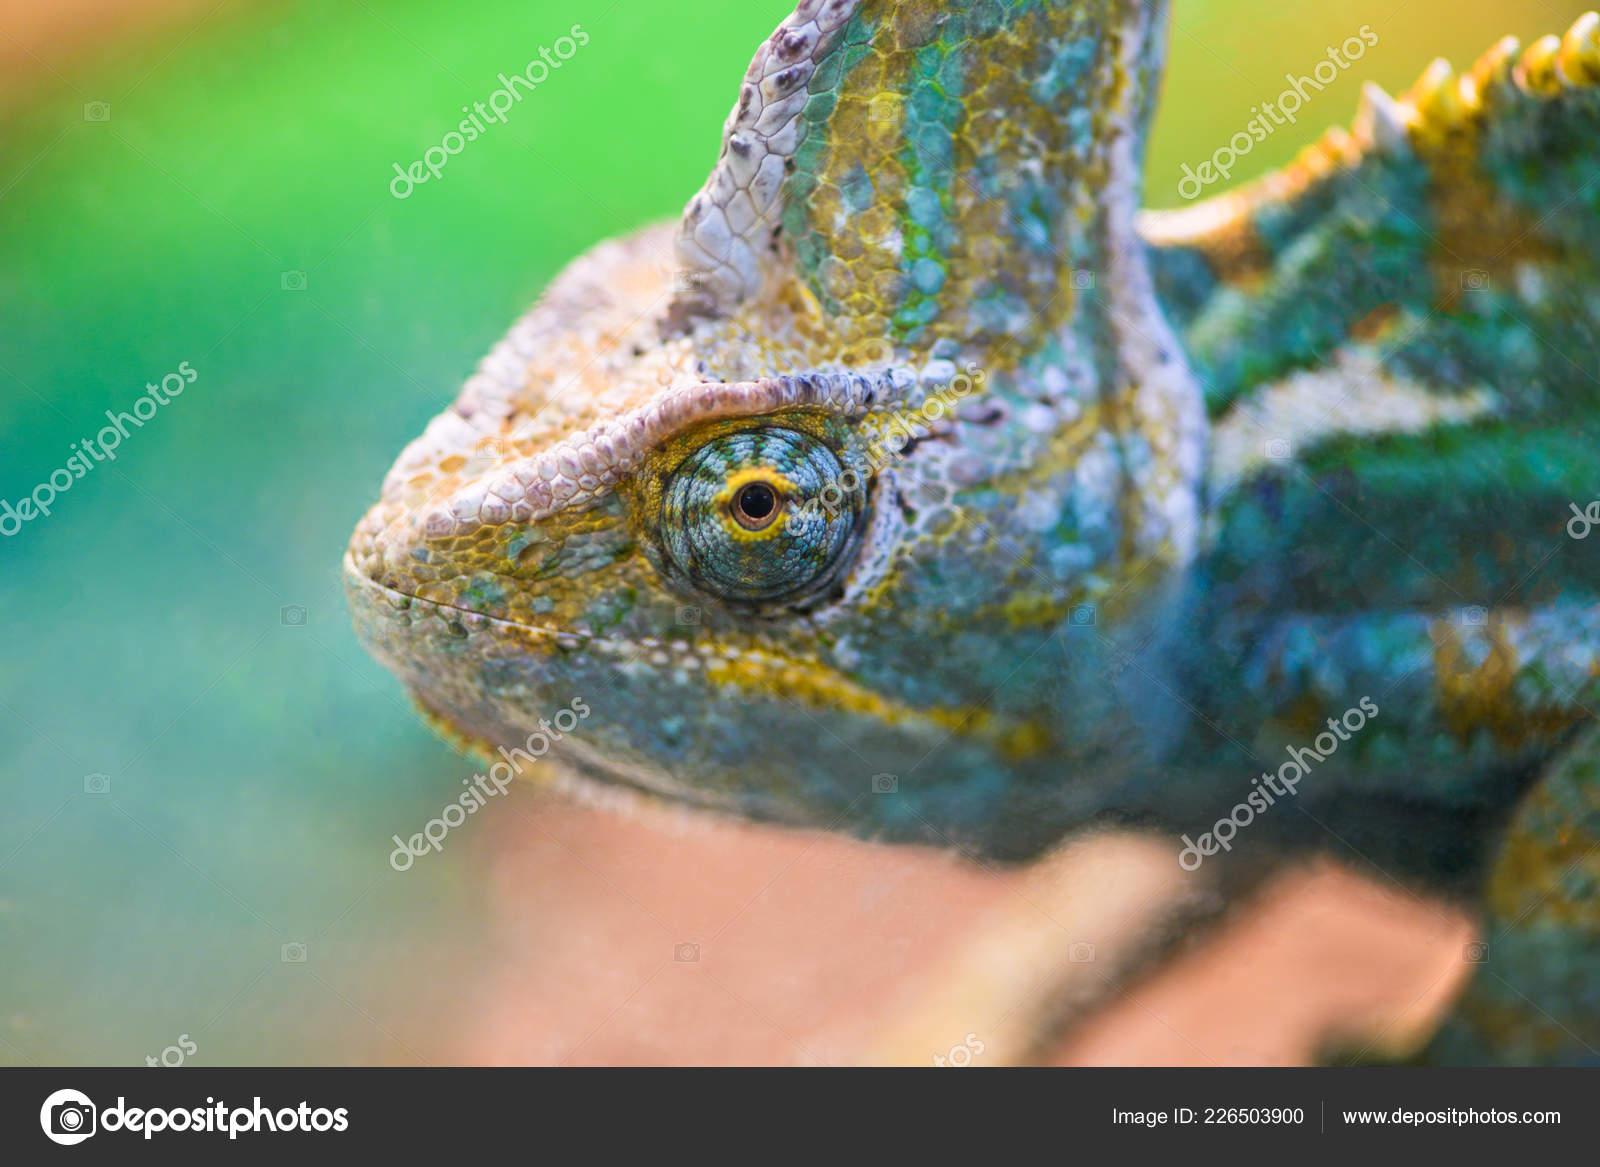 Beautiful Bright Chameleon Looks Glass Terrarium Stock Photo